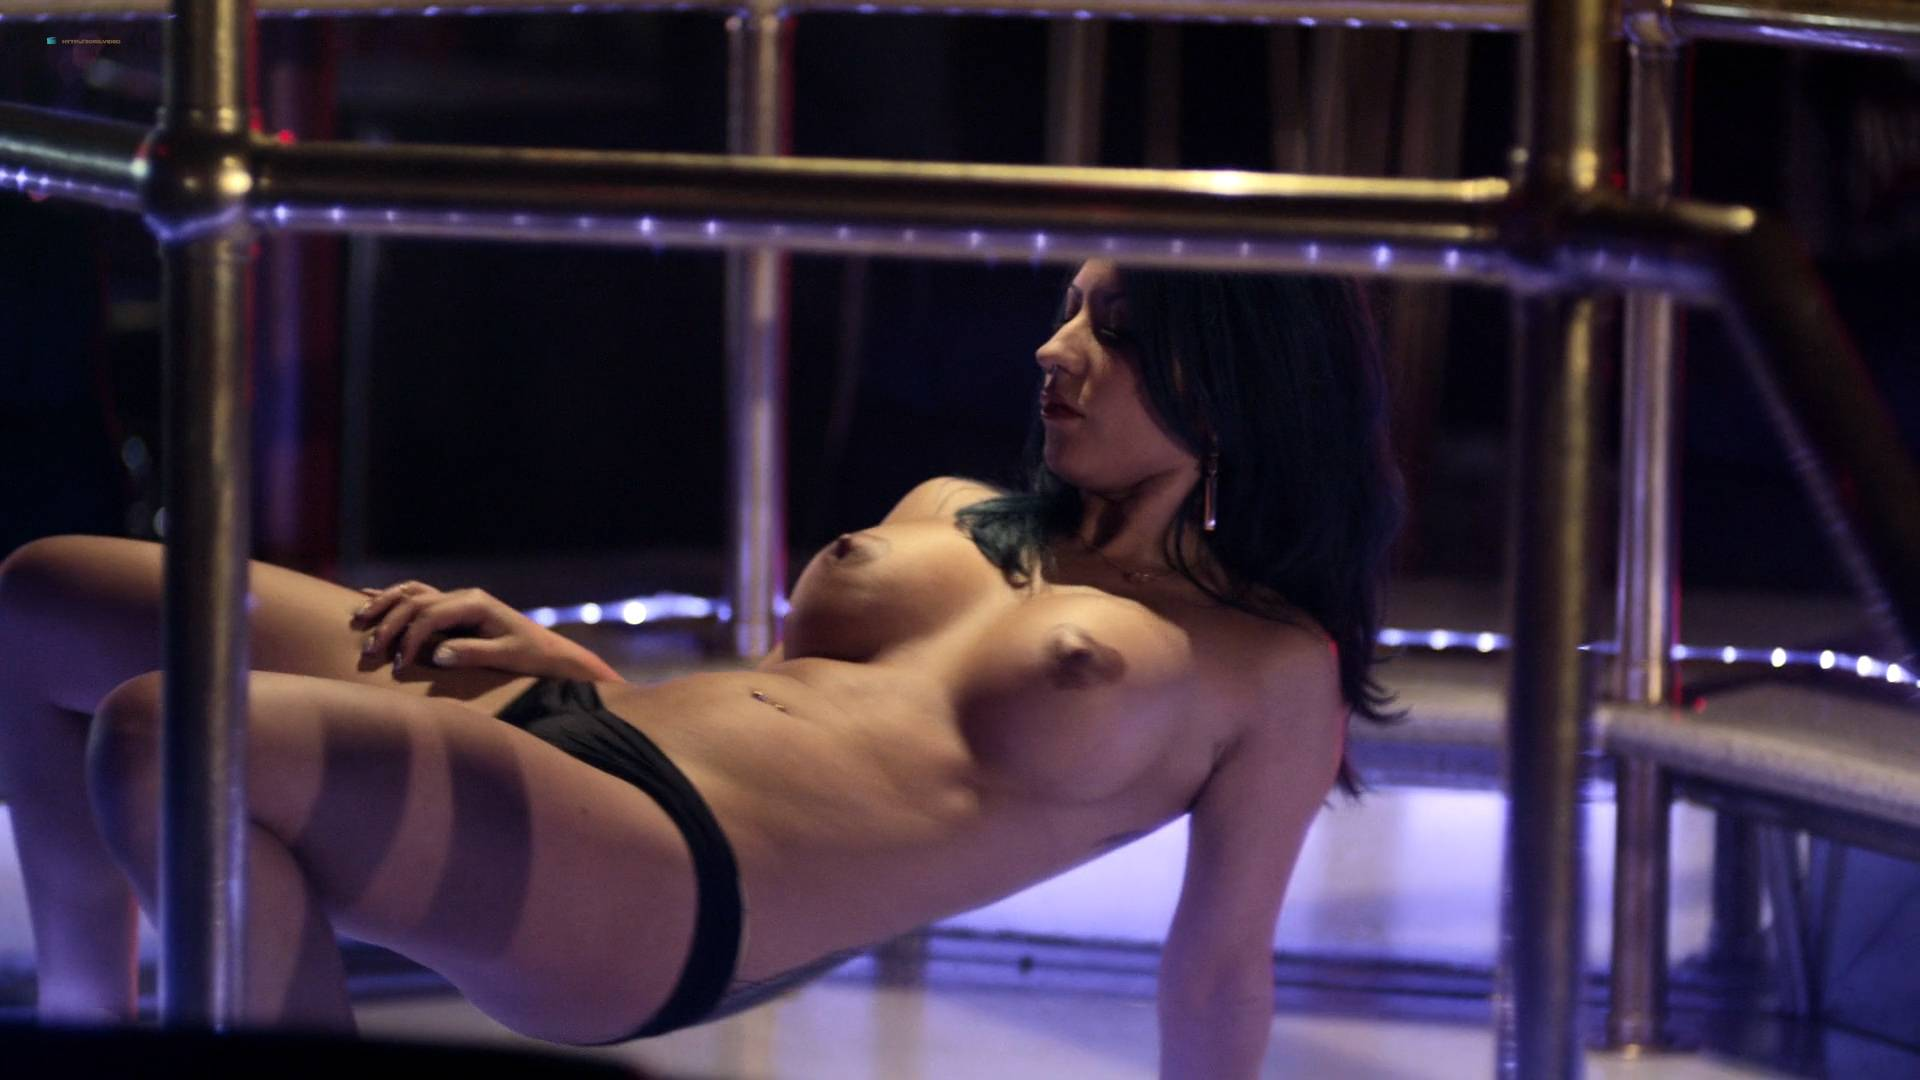 Helena Mattsson hot, Ileana Huxley and April Jorgensen nude topless - Code of Honor (2016) HD 1080p (15)